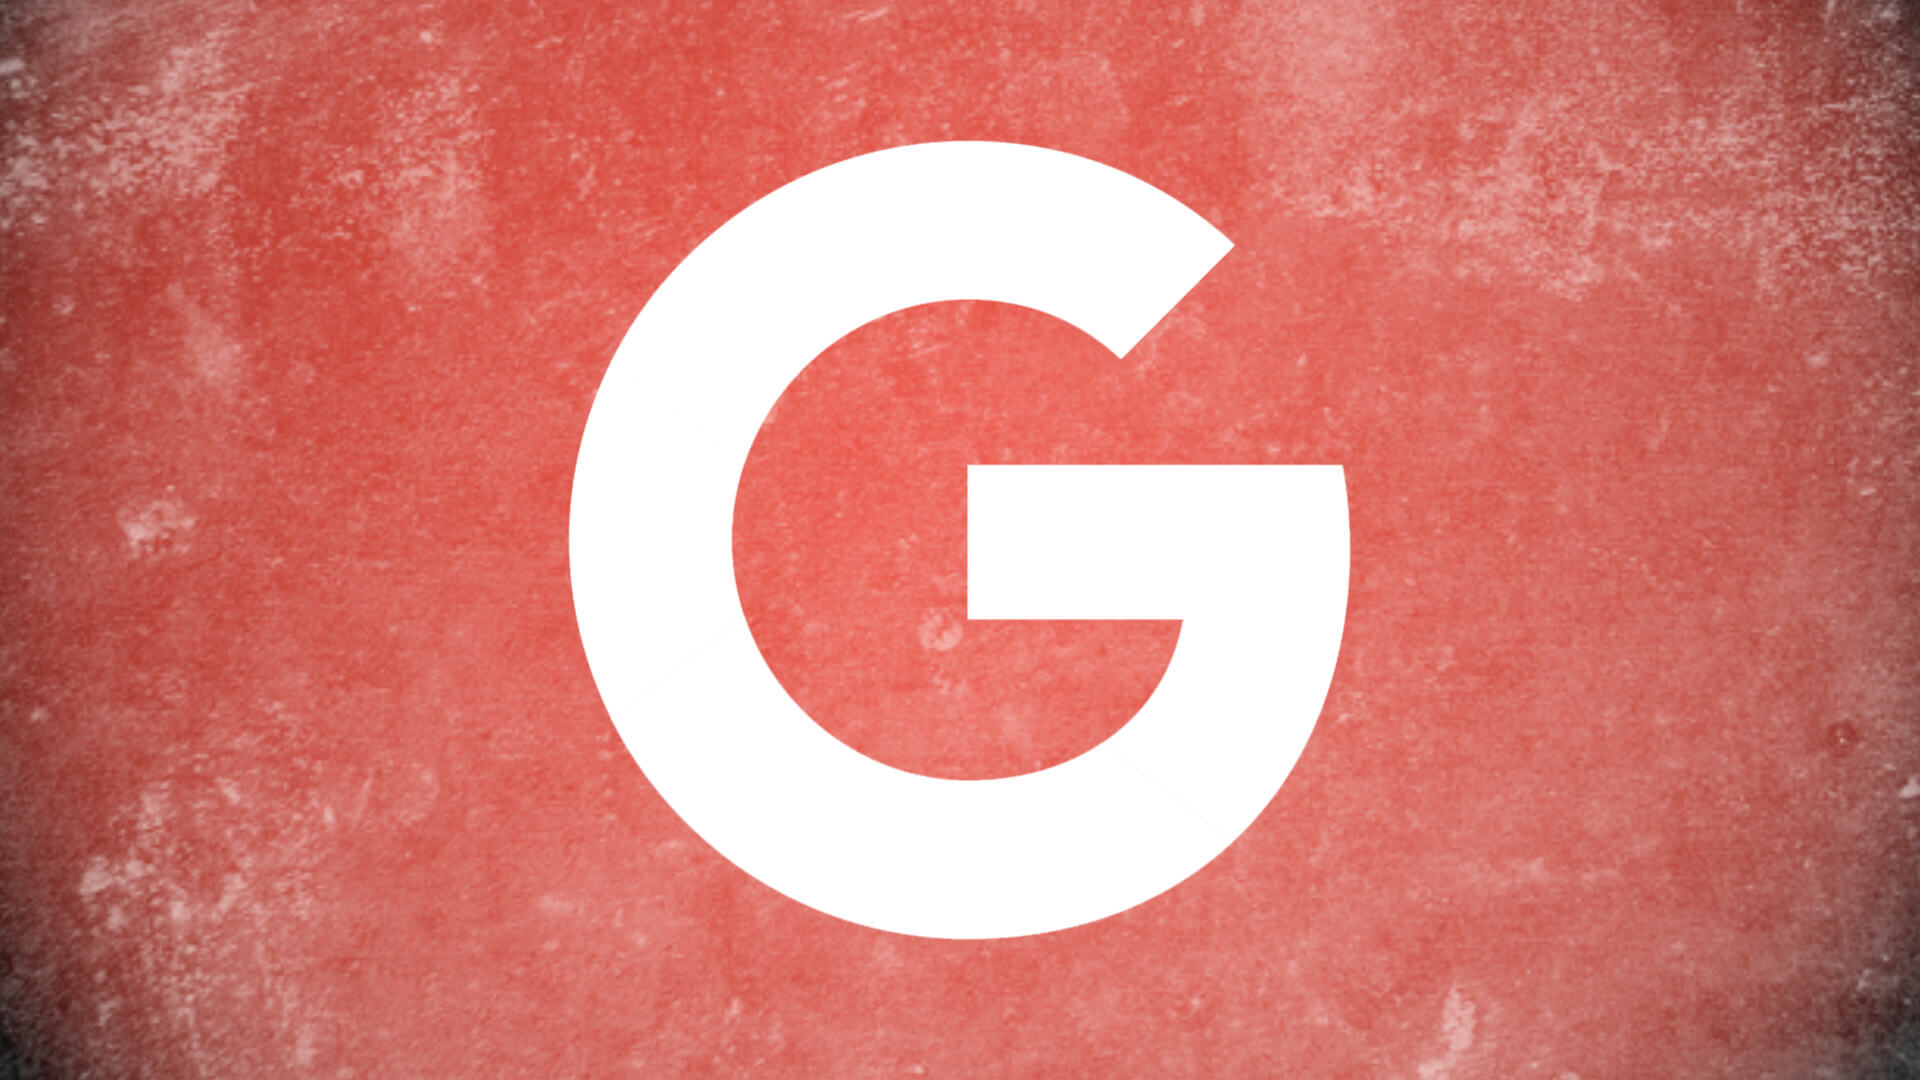 google-logo-red8-1920